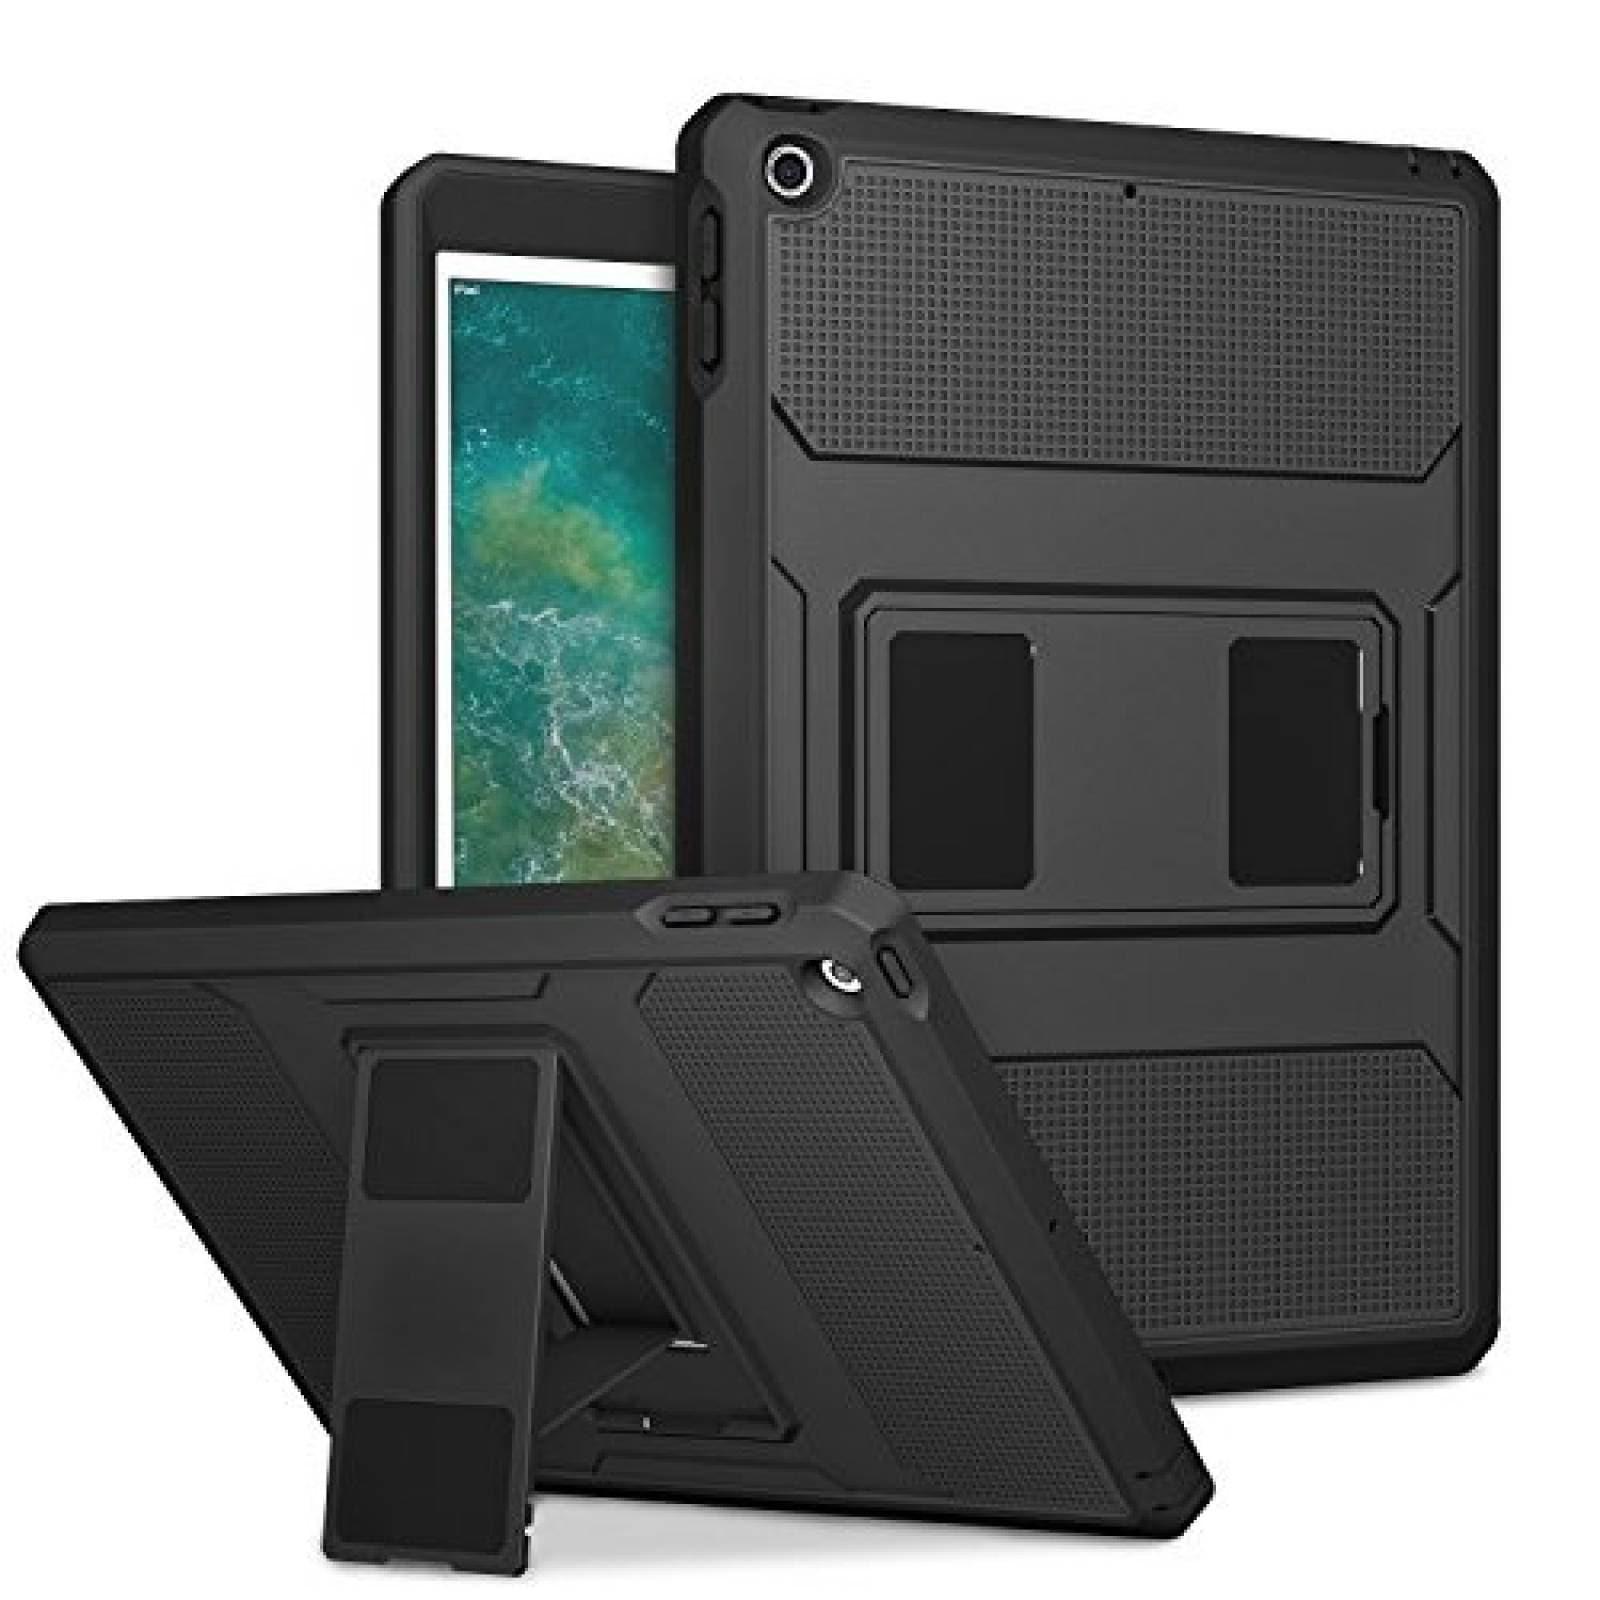 Funda MoKo para iPad 5 6 gen uso rudo Negro